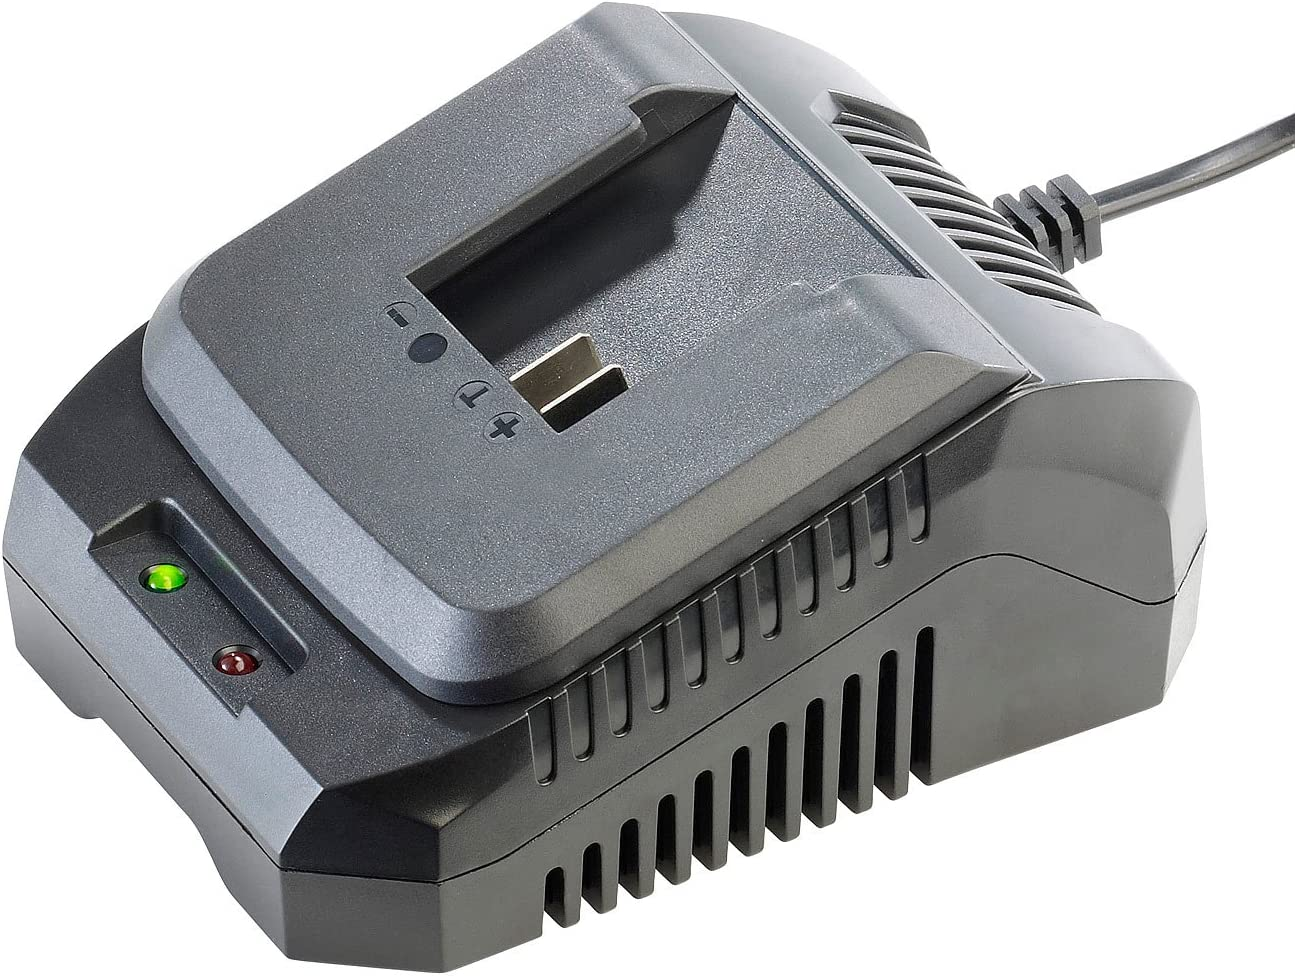 Agt Professional Zubehör Zu Ladegerät Akkuschrauber Elektronik